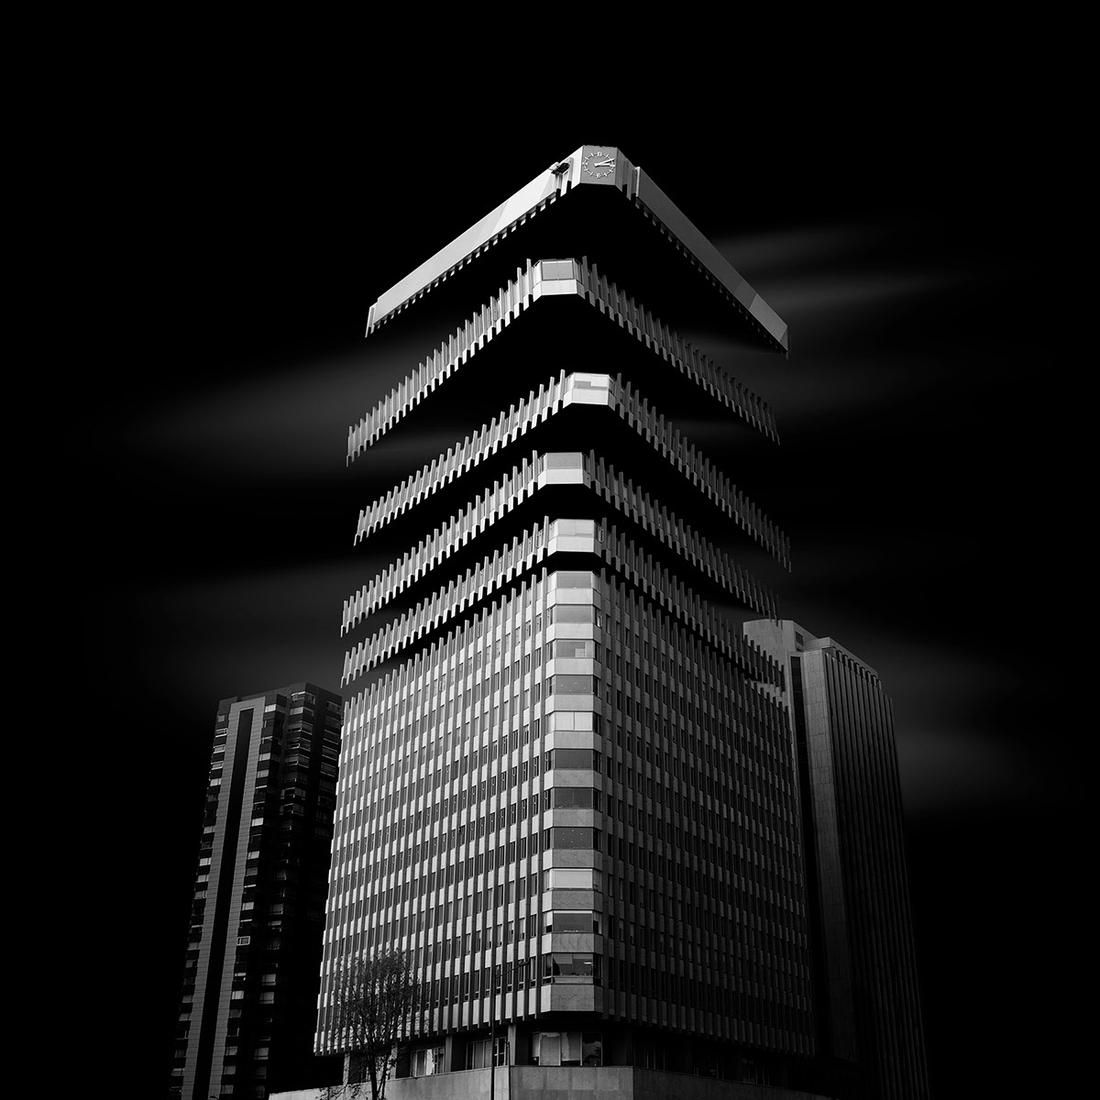 01-Daniel-Garay-Arango-Black-and-White-Surreal-Photographs-Architectural-Deconstruction-www-designstack-co